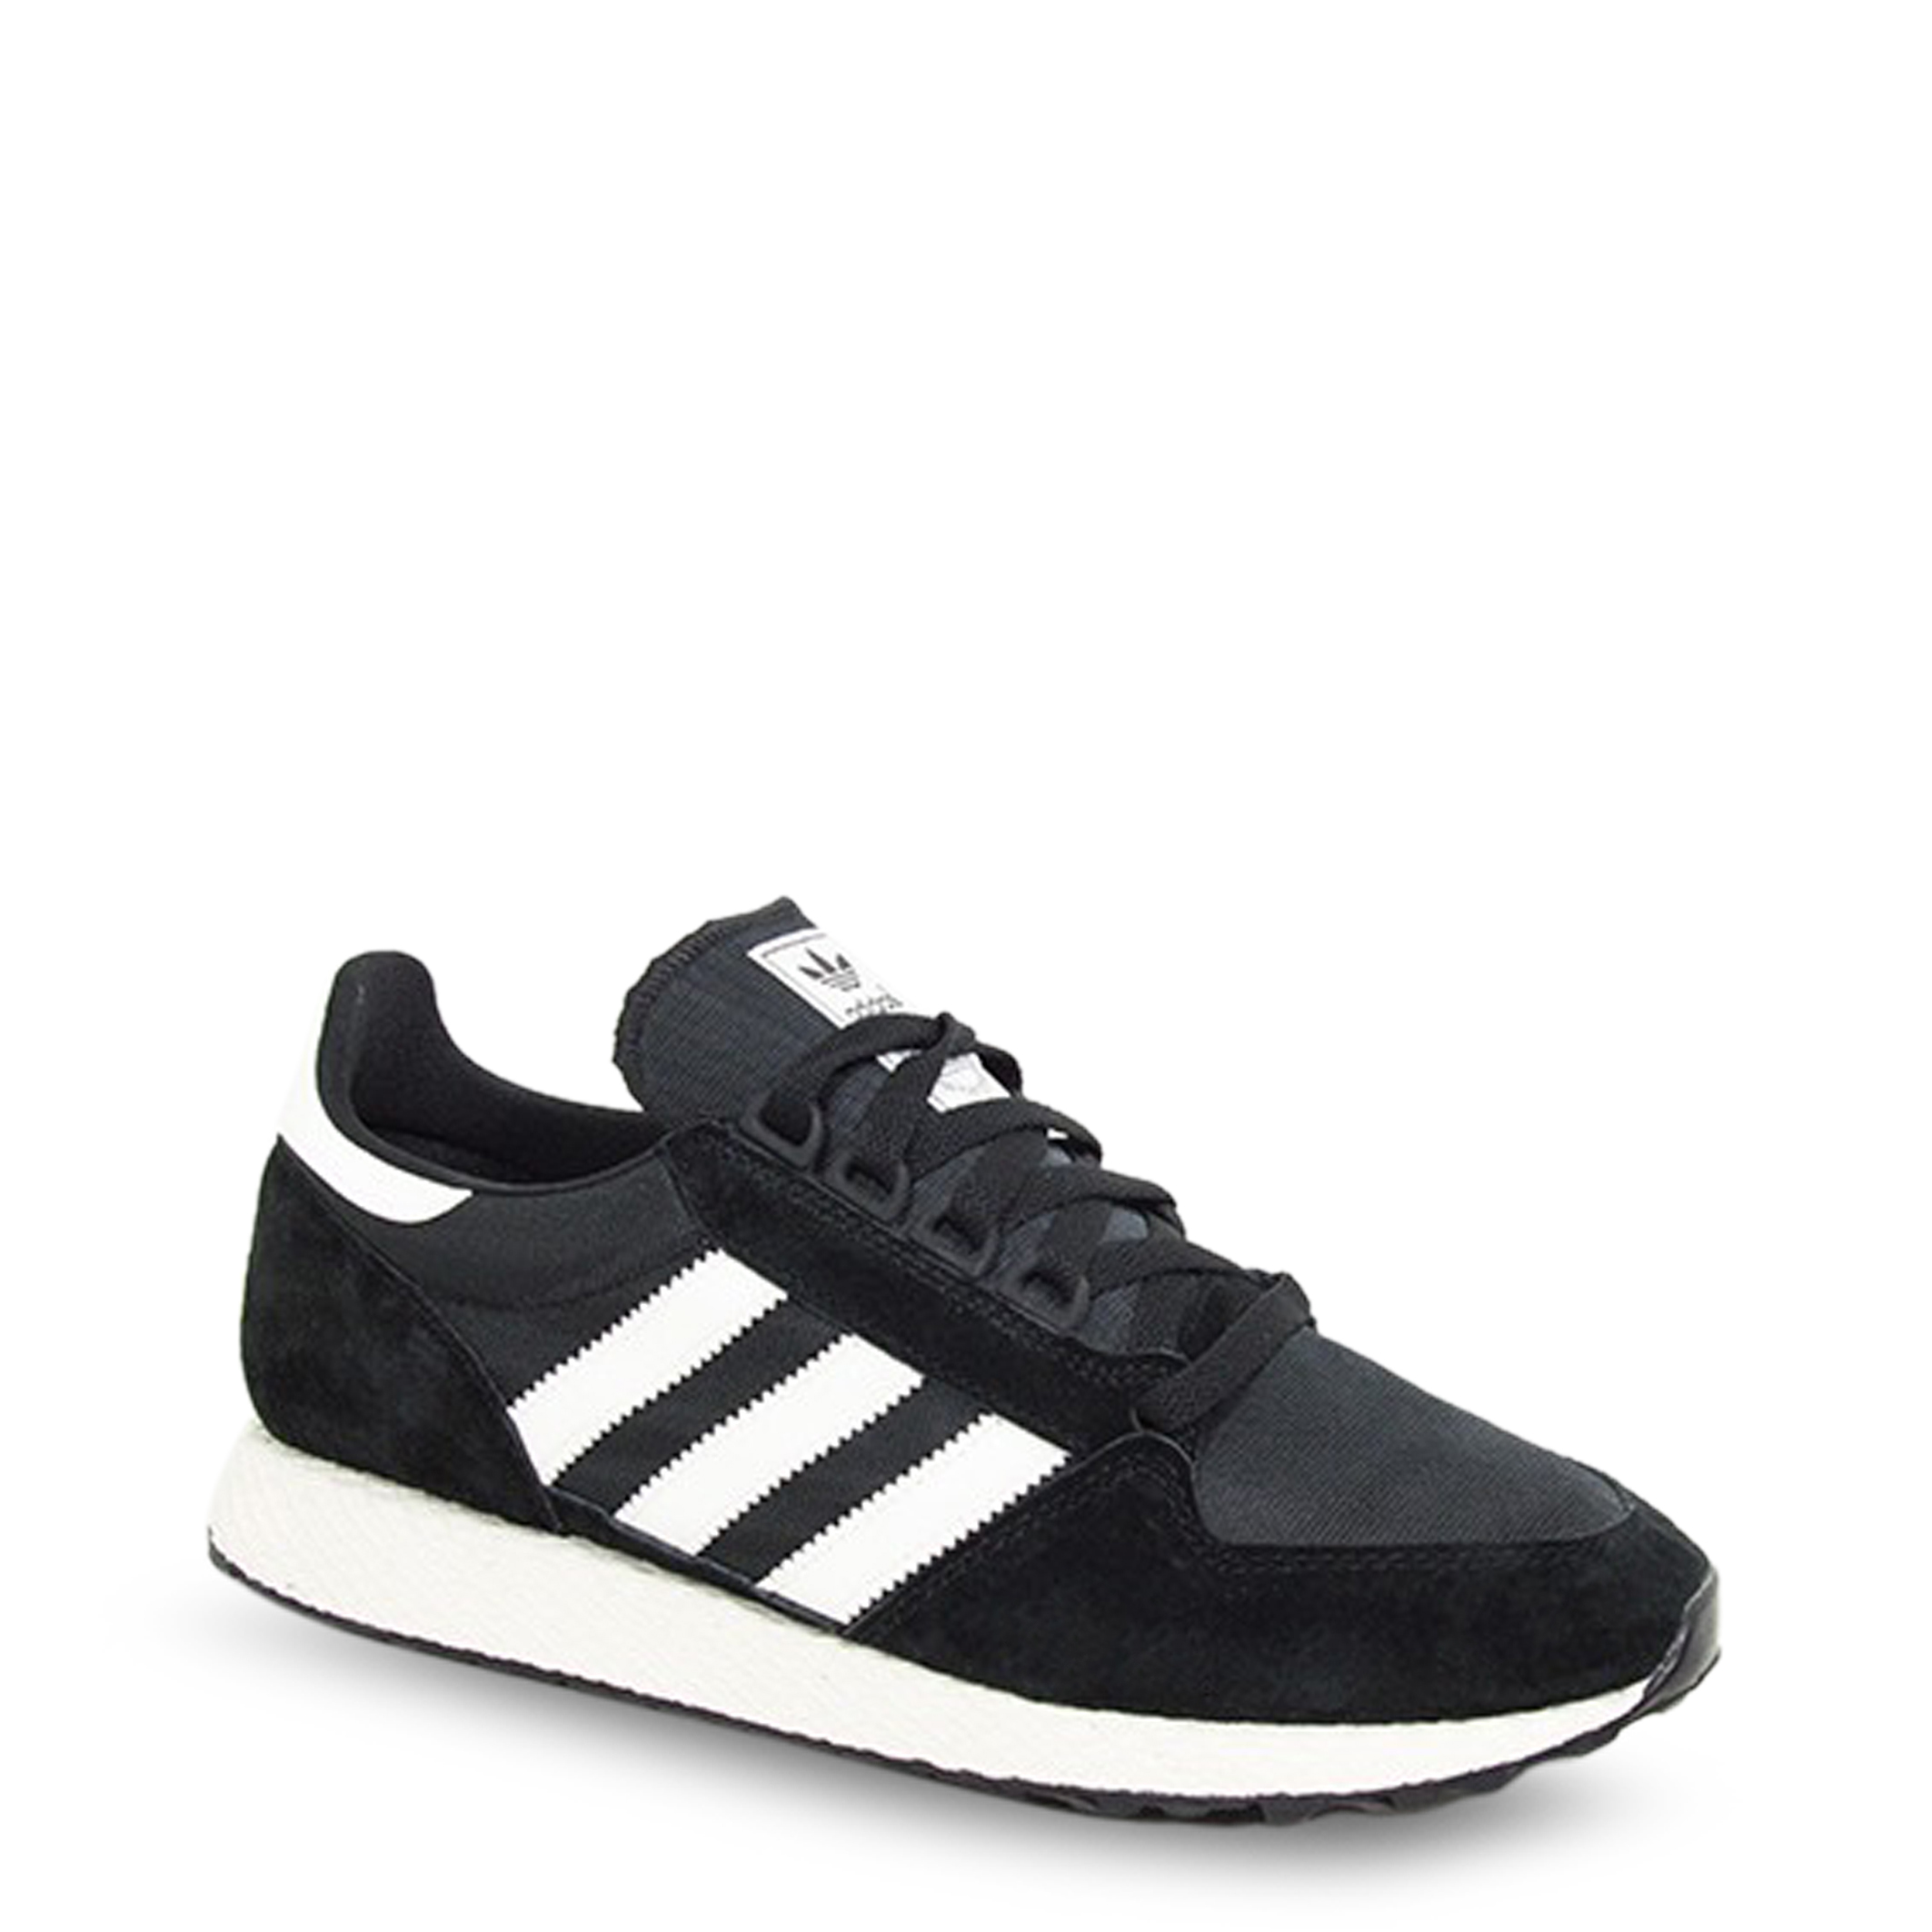 Sneakers-Adidas-ForestGrove-Uomo-Nero-104275 miniatura 2